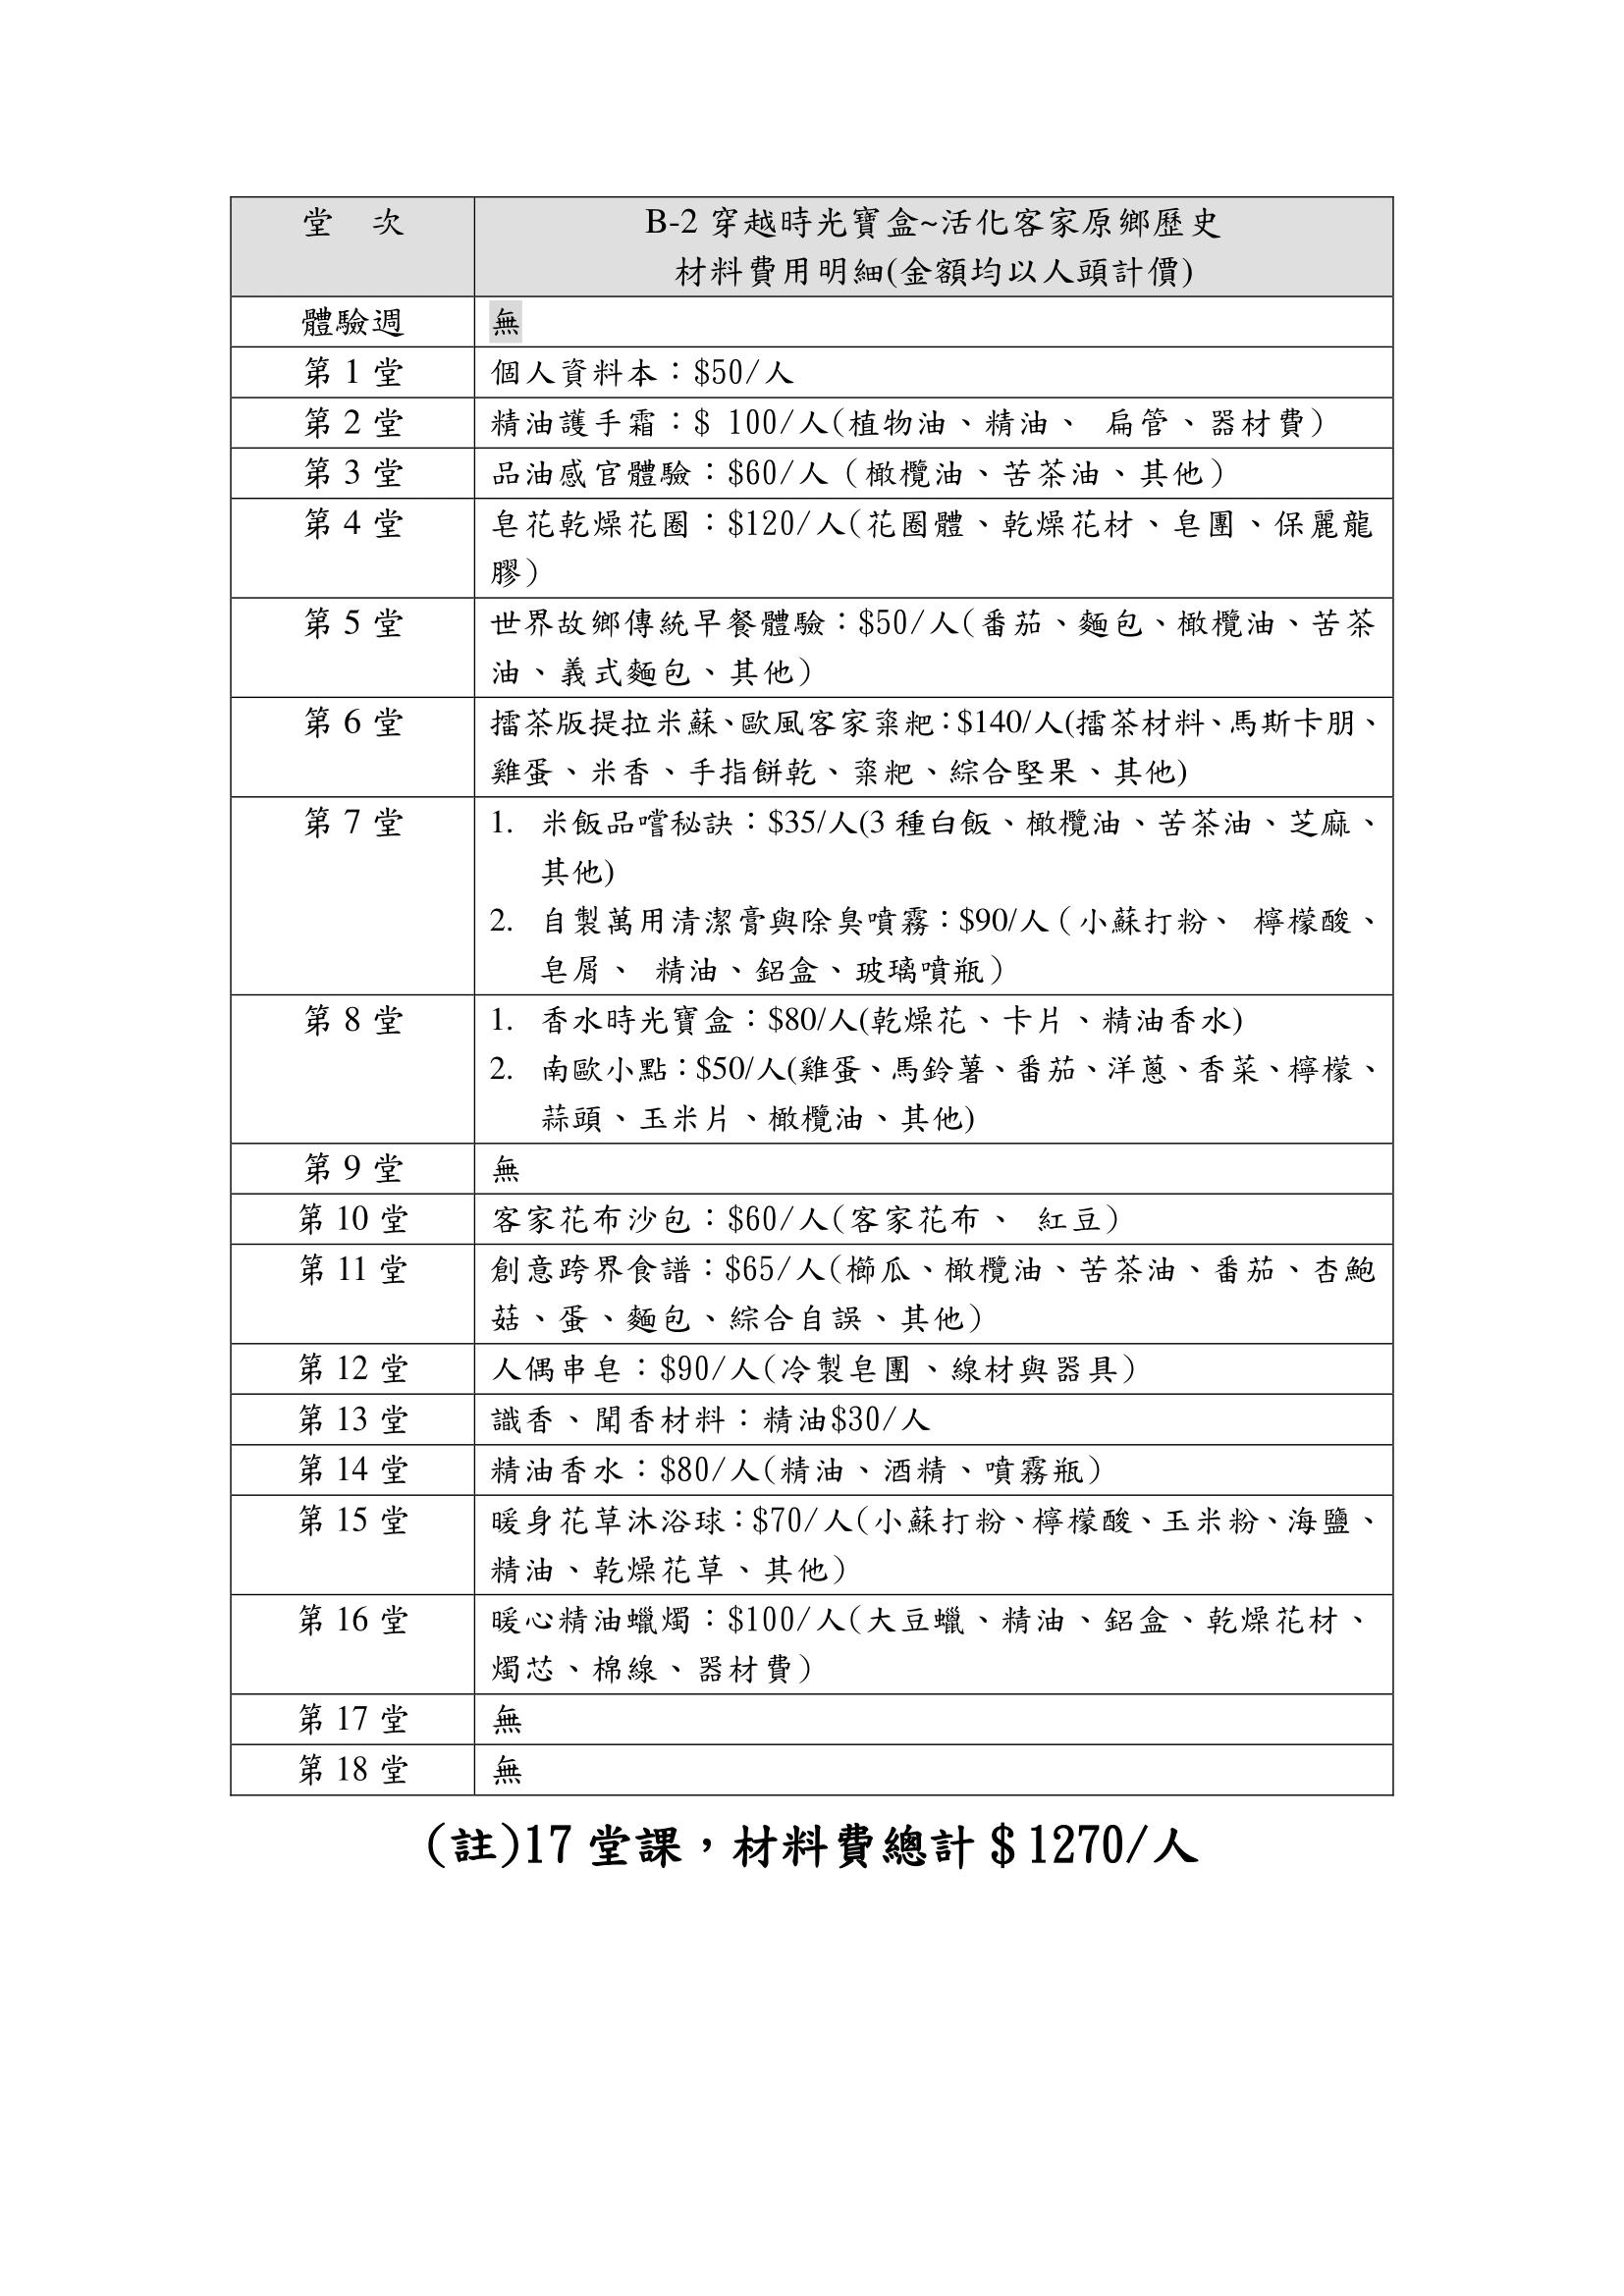 材料費明細-1.png